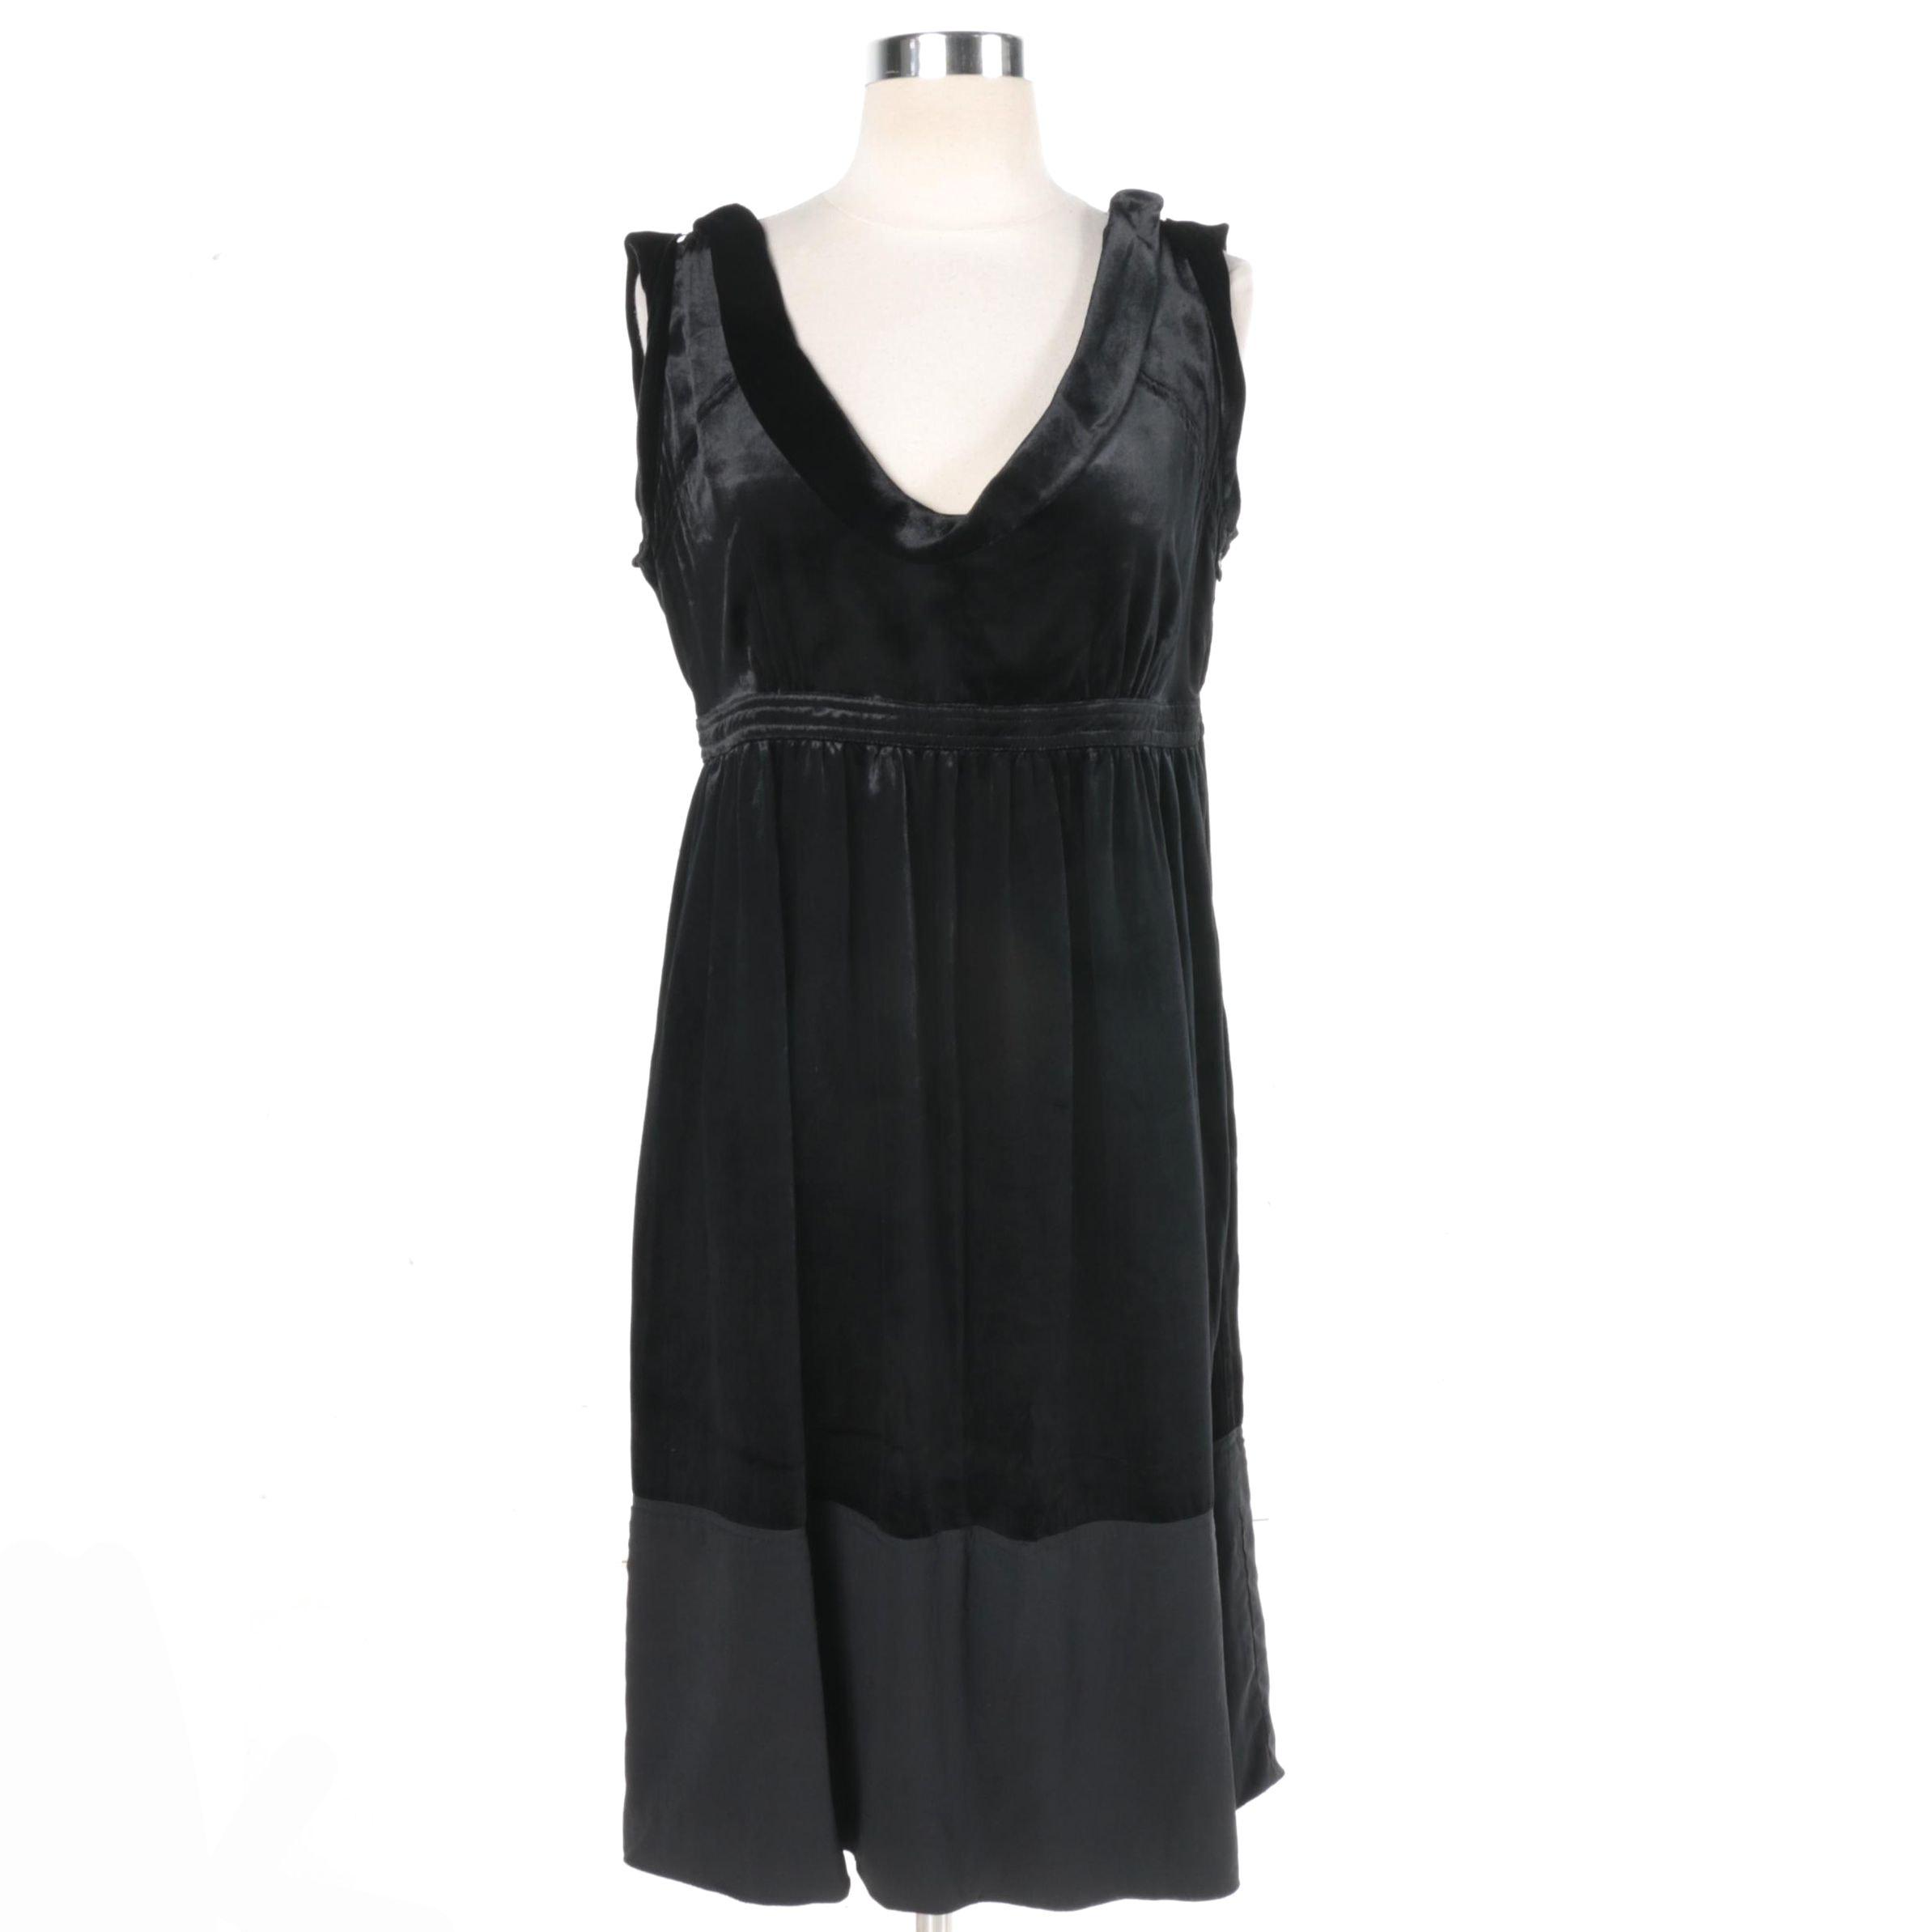 Burberry London Black Satin Sleeveless Dress